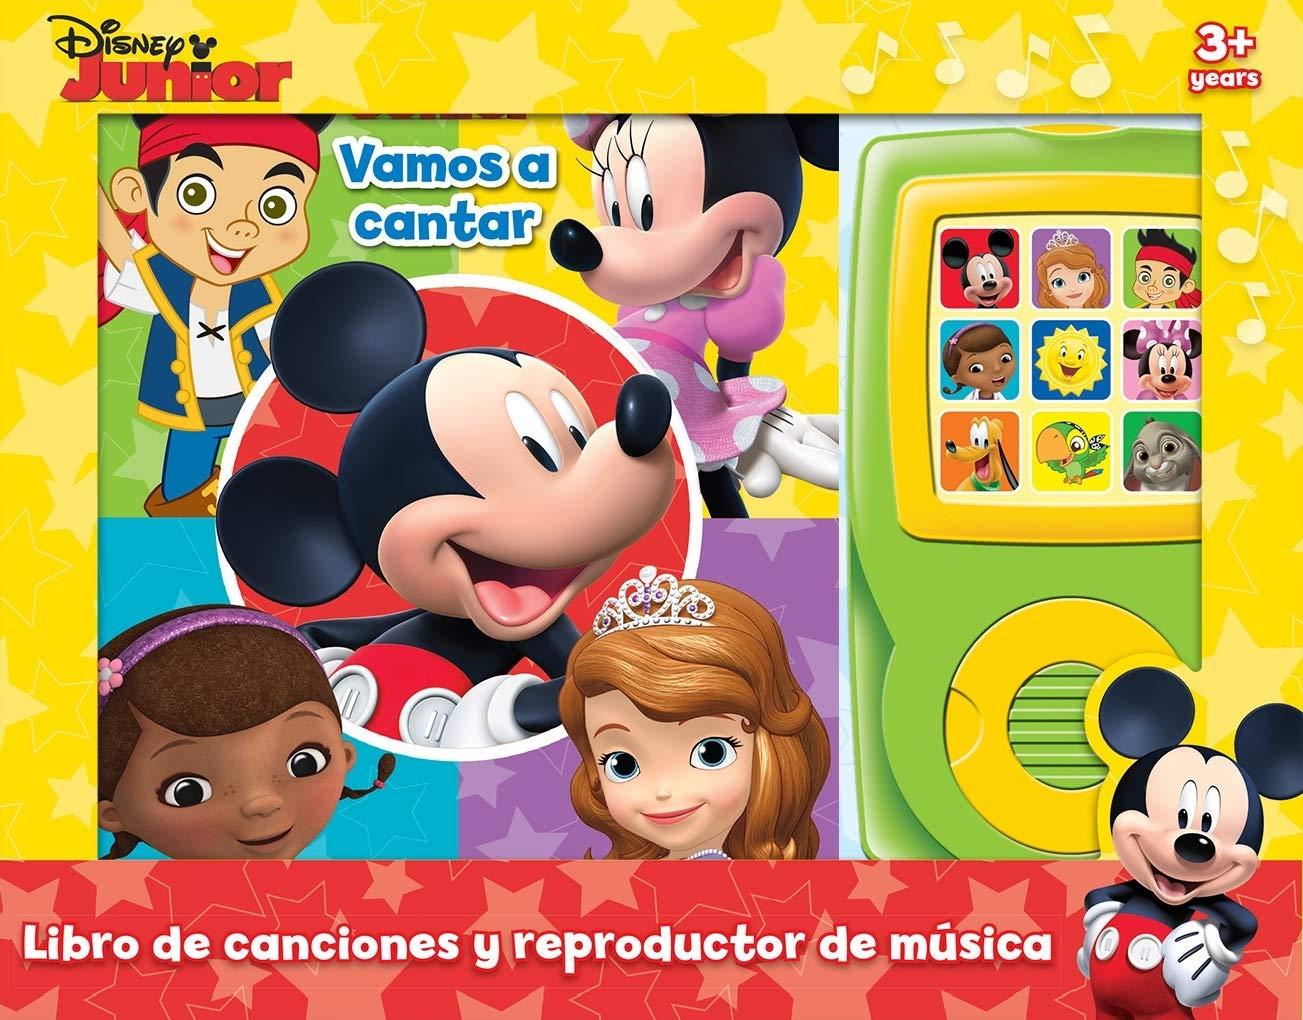 MI CAJA MUSICAL DISNEY JR LMOM: VAMOS A CANTAR: Amazon.es: Disney ...